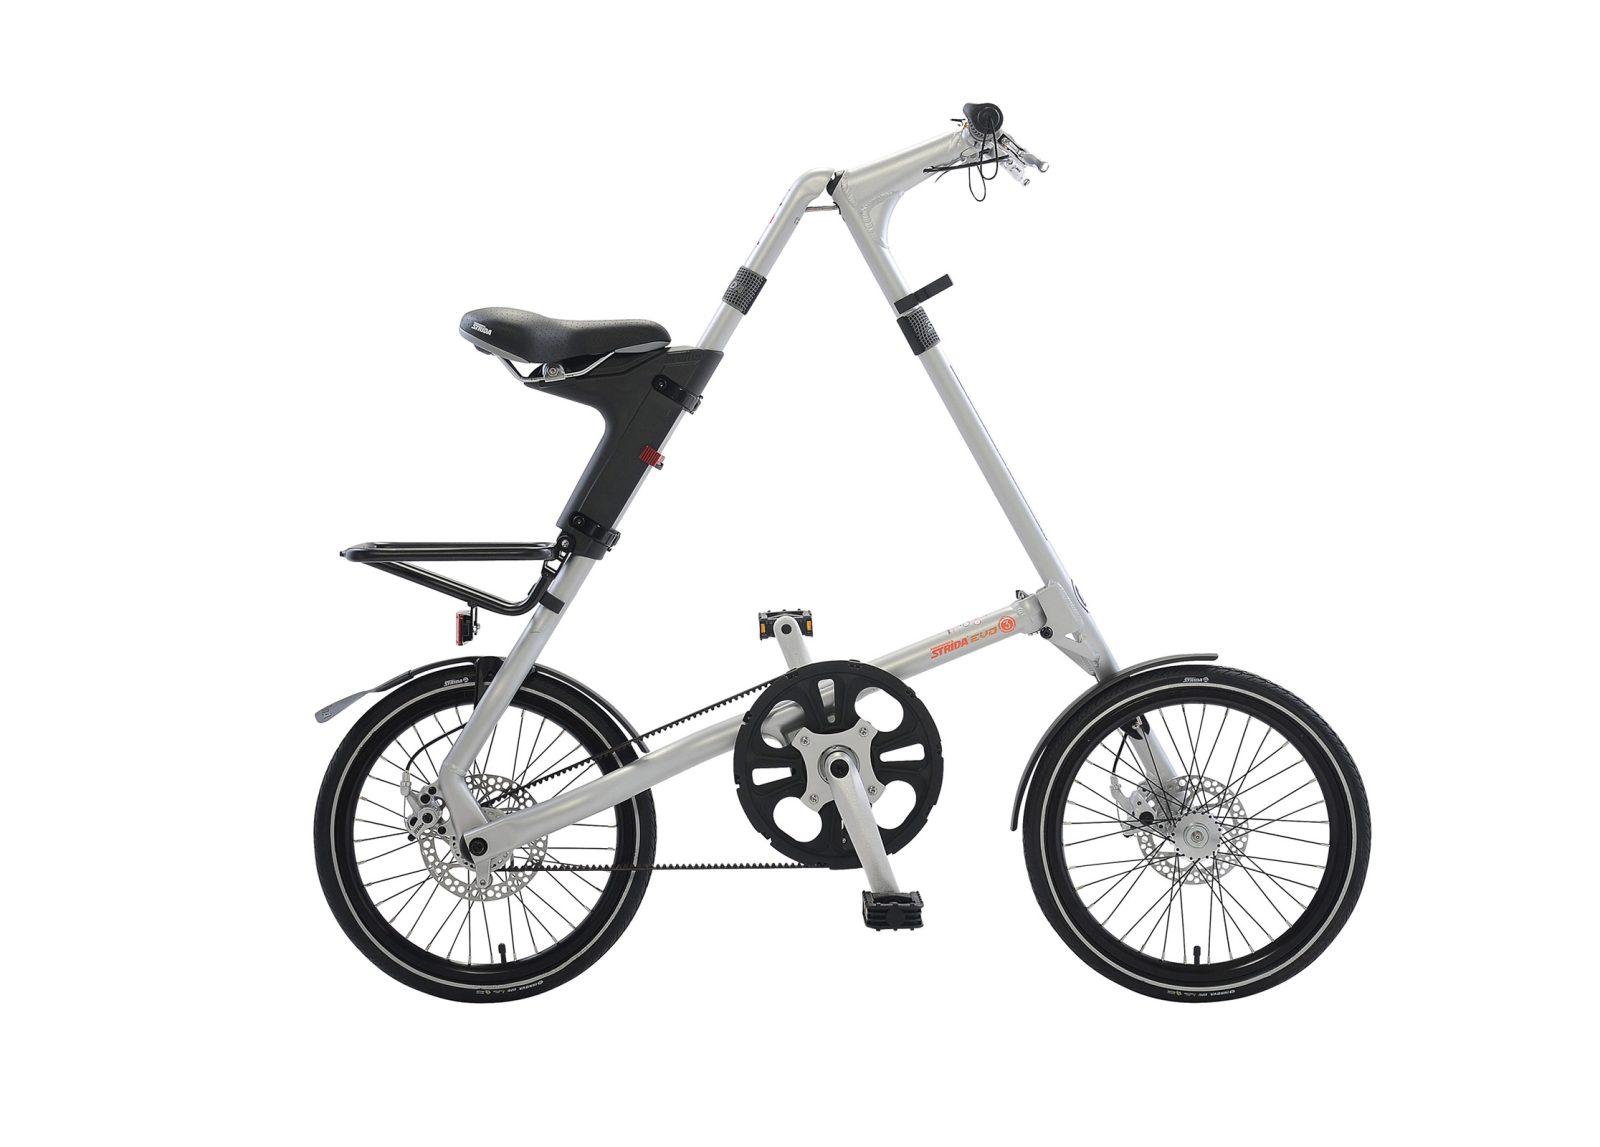 STRiDA EVO Folding Bicycle, Brushed Silver-31720